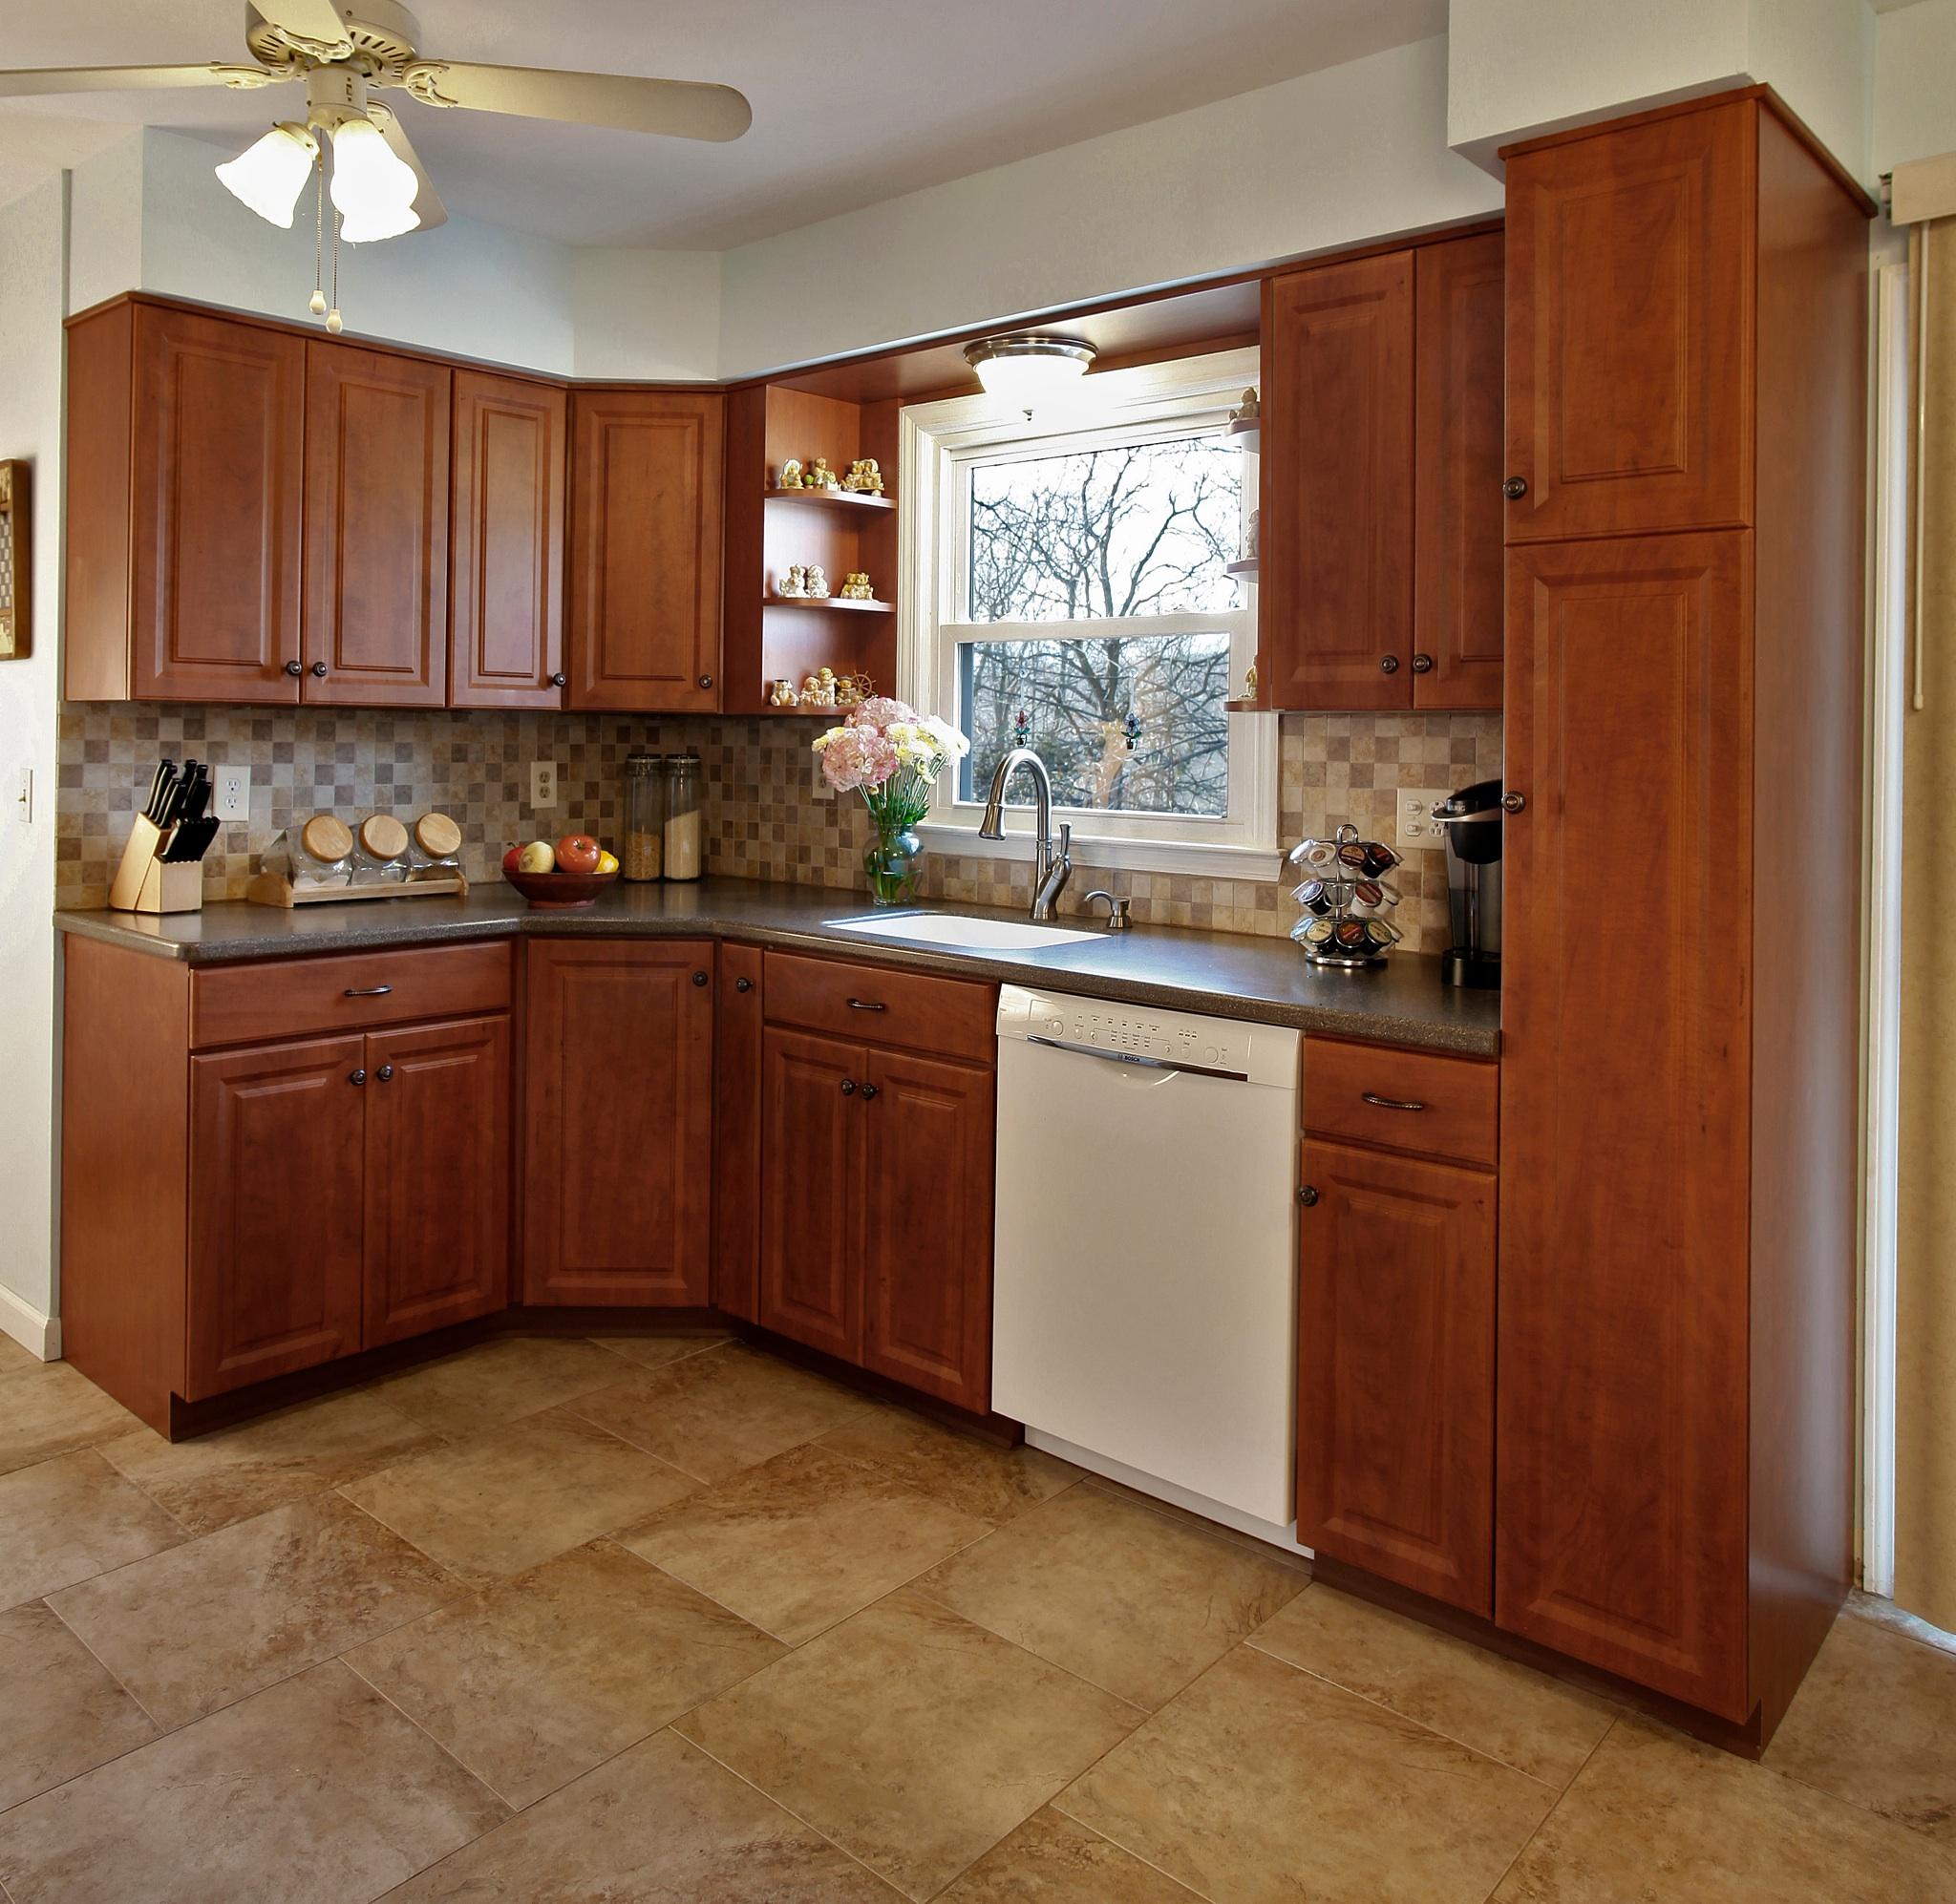 Differences Between 6 Common Types Of Cabinet Doors